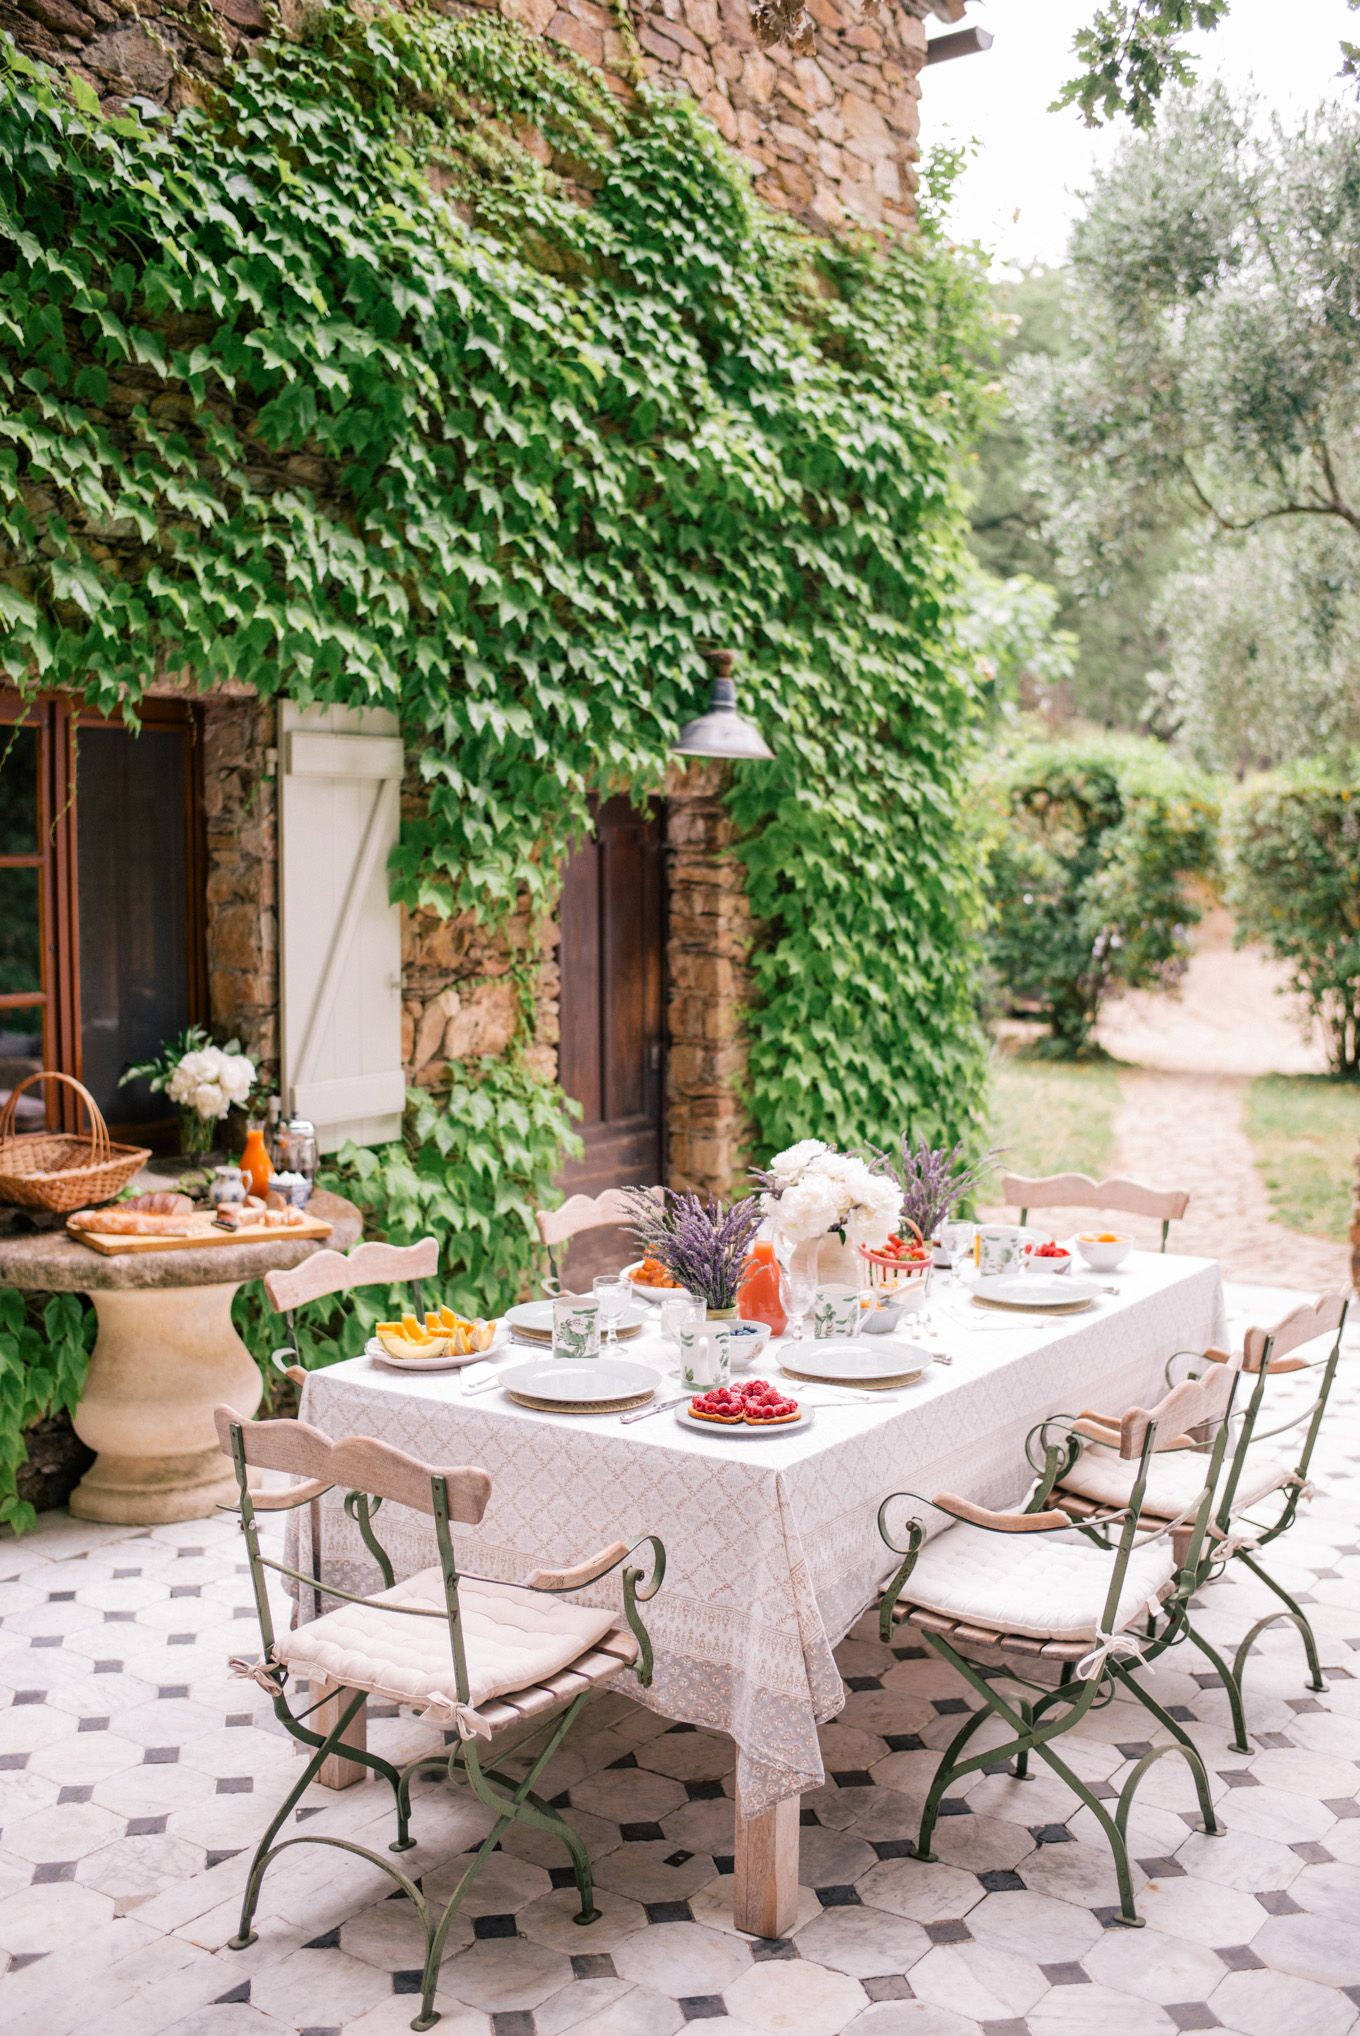 Contributor Series Market Breakfast Table In France Julia Berolzheimer Breakfast Table Outdoor Outdoor Dining